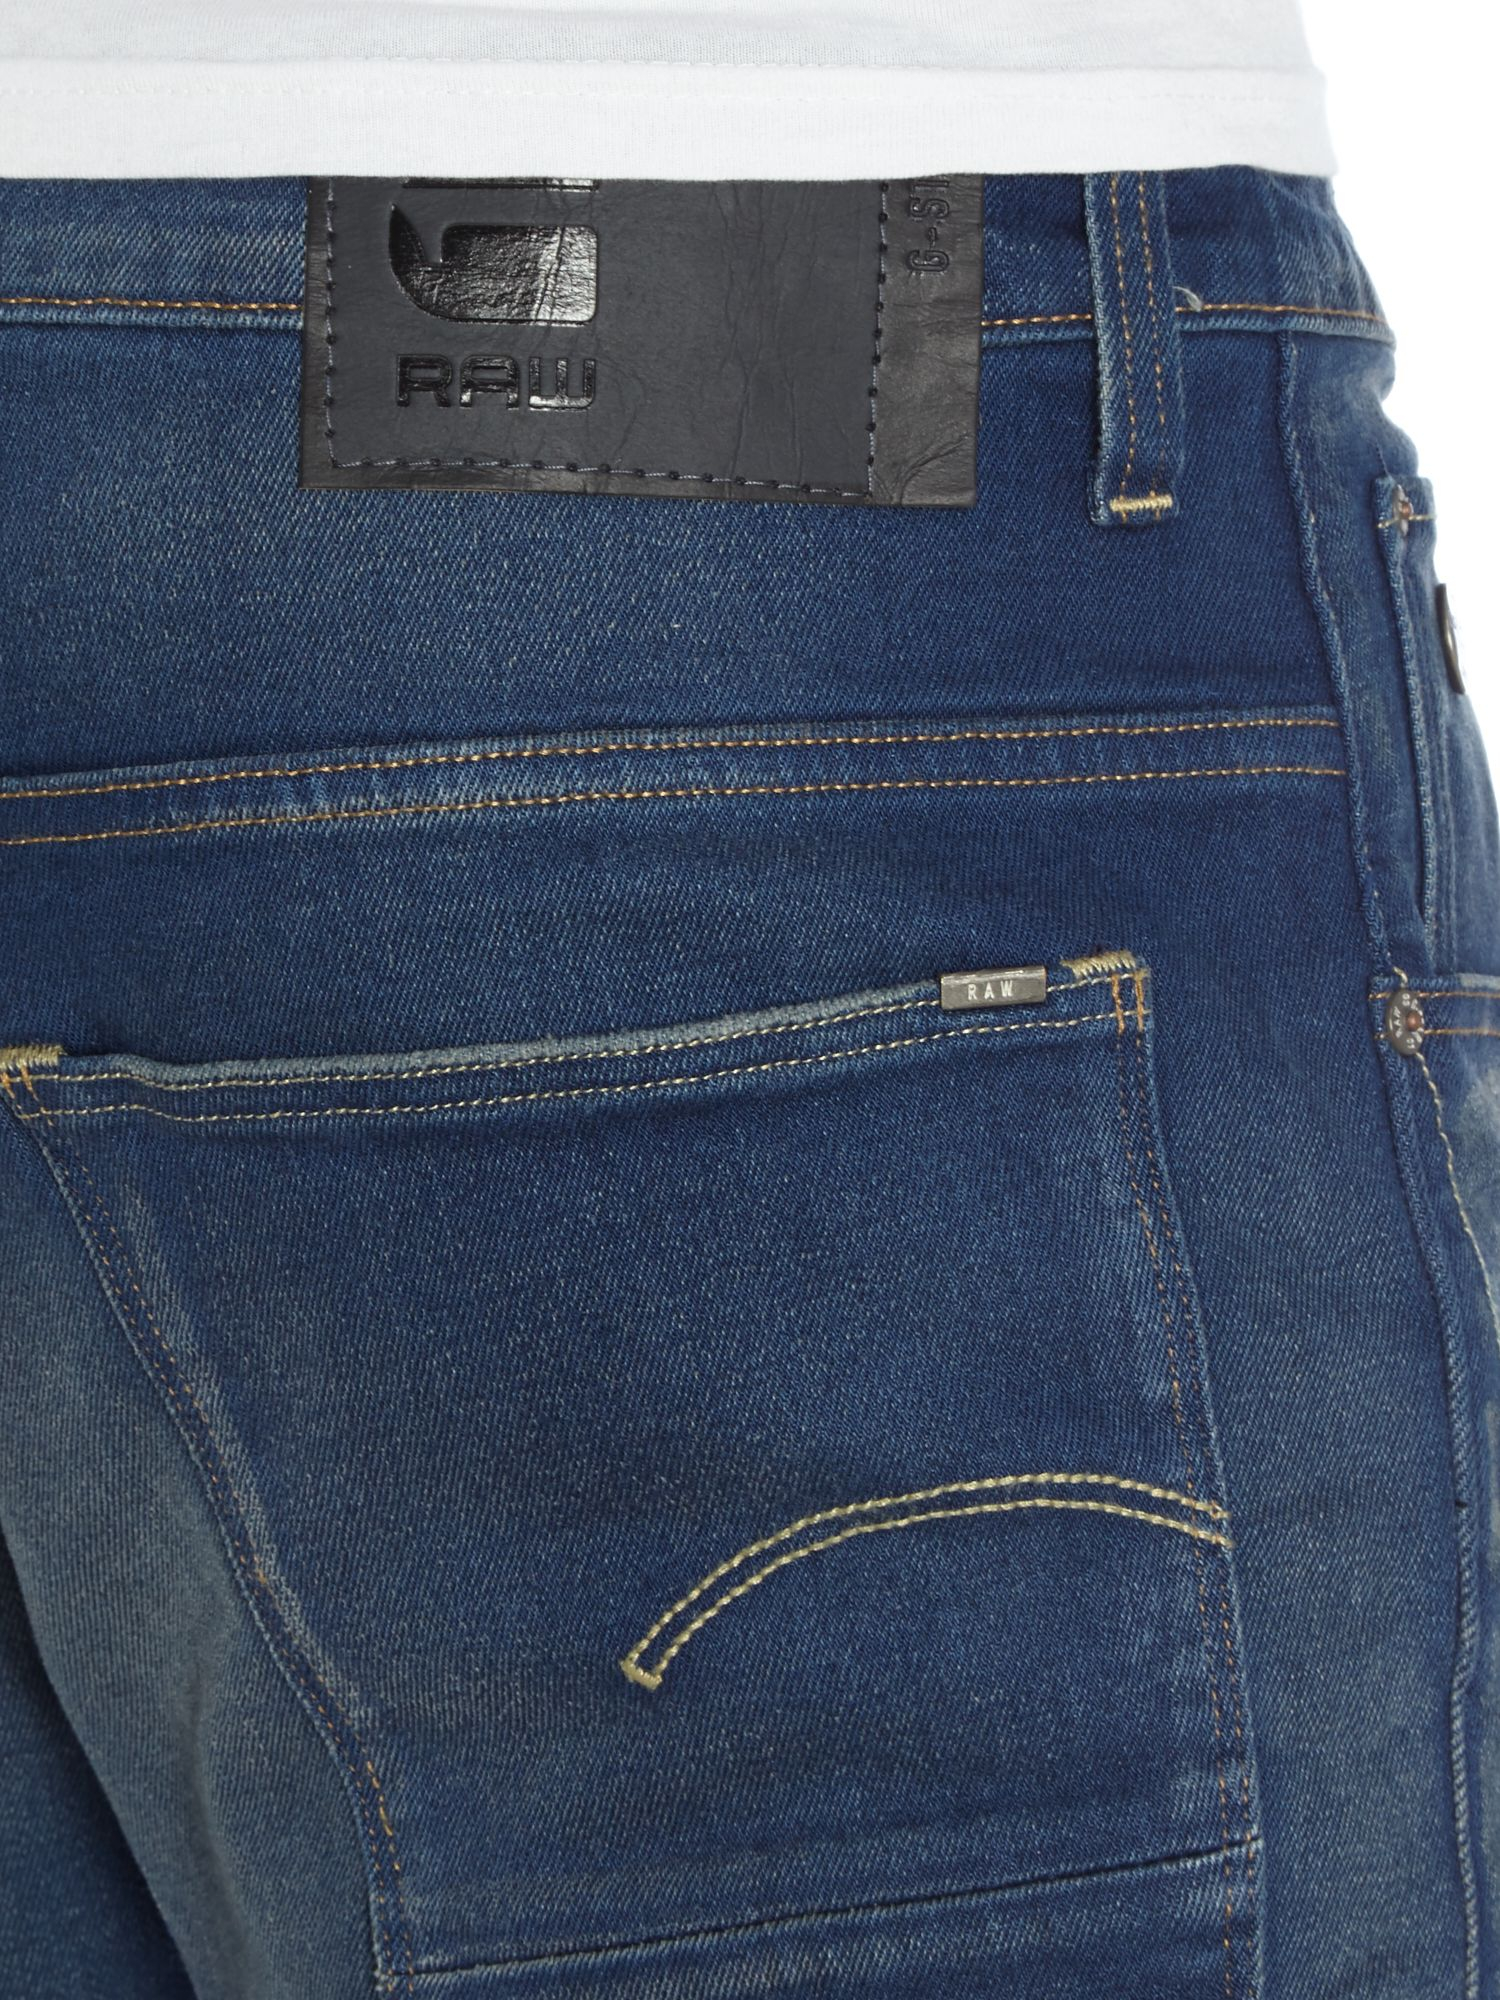 g star raw arc 3d slim med aged firro jeans in blue for. Black Bedroom Furniture Sets. Home Design Ideas